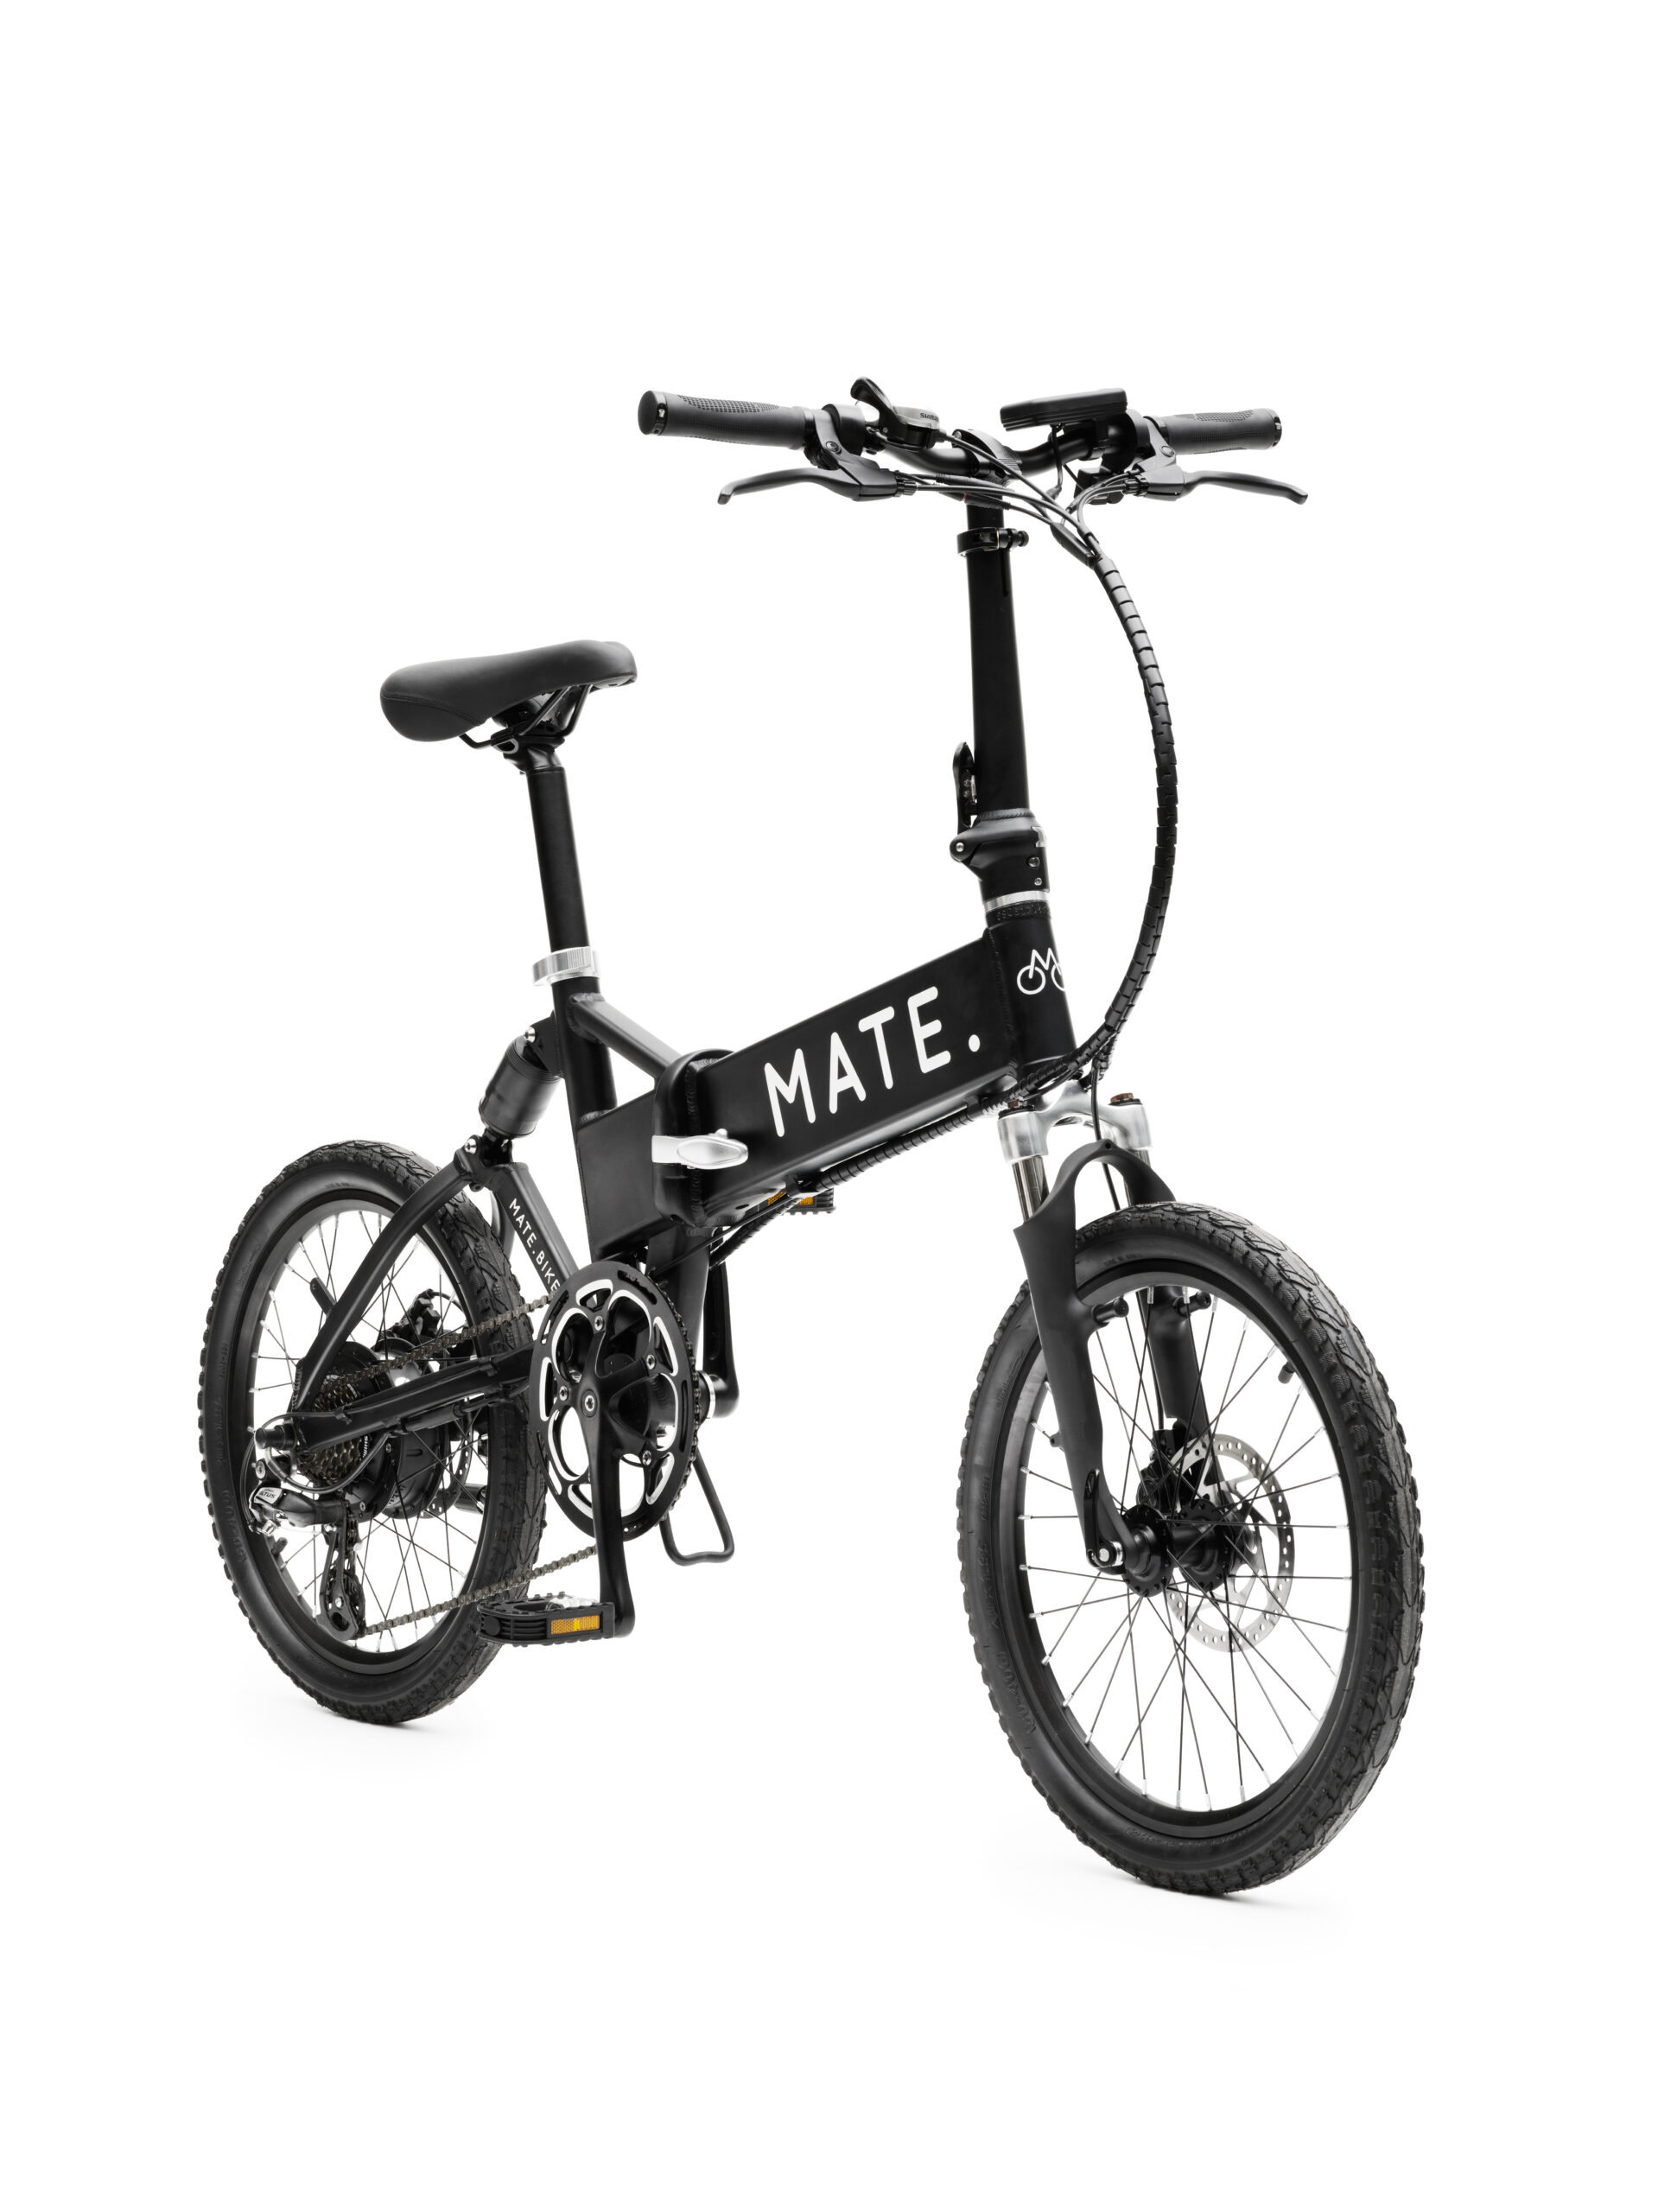 Schwarze Farbe Elektrofahrradkumpel City Classic Packshot des Fahrrads